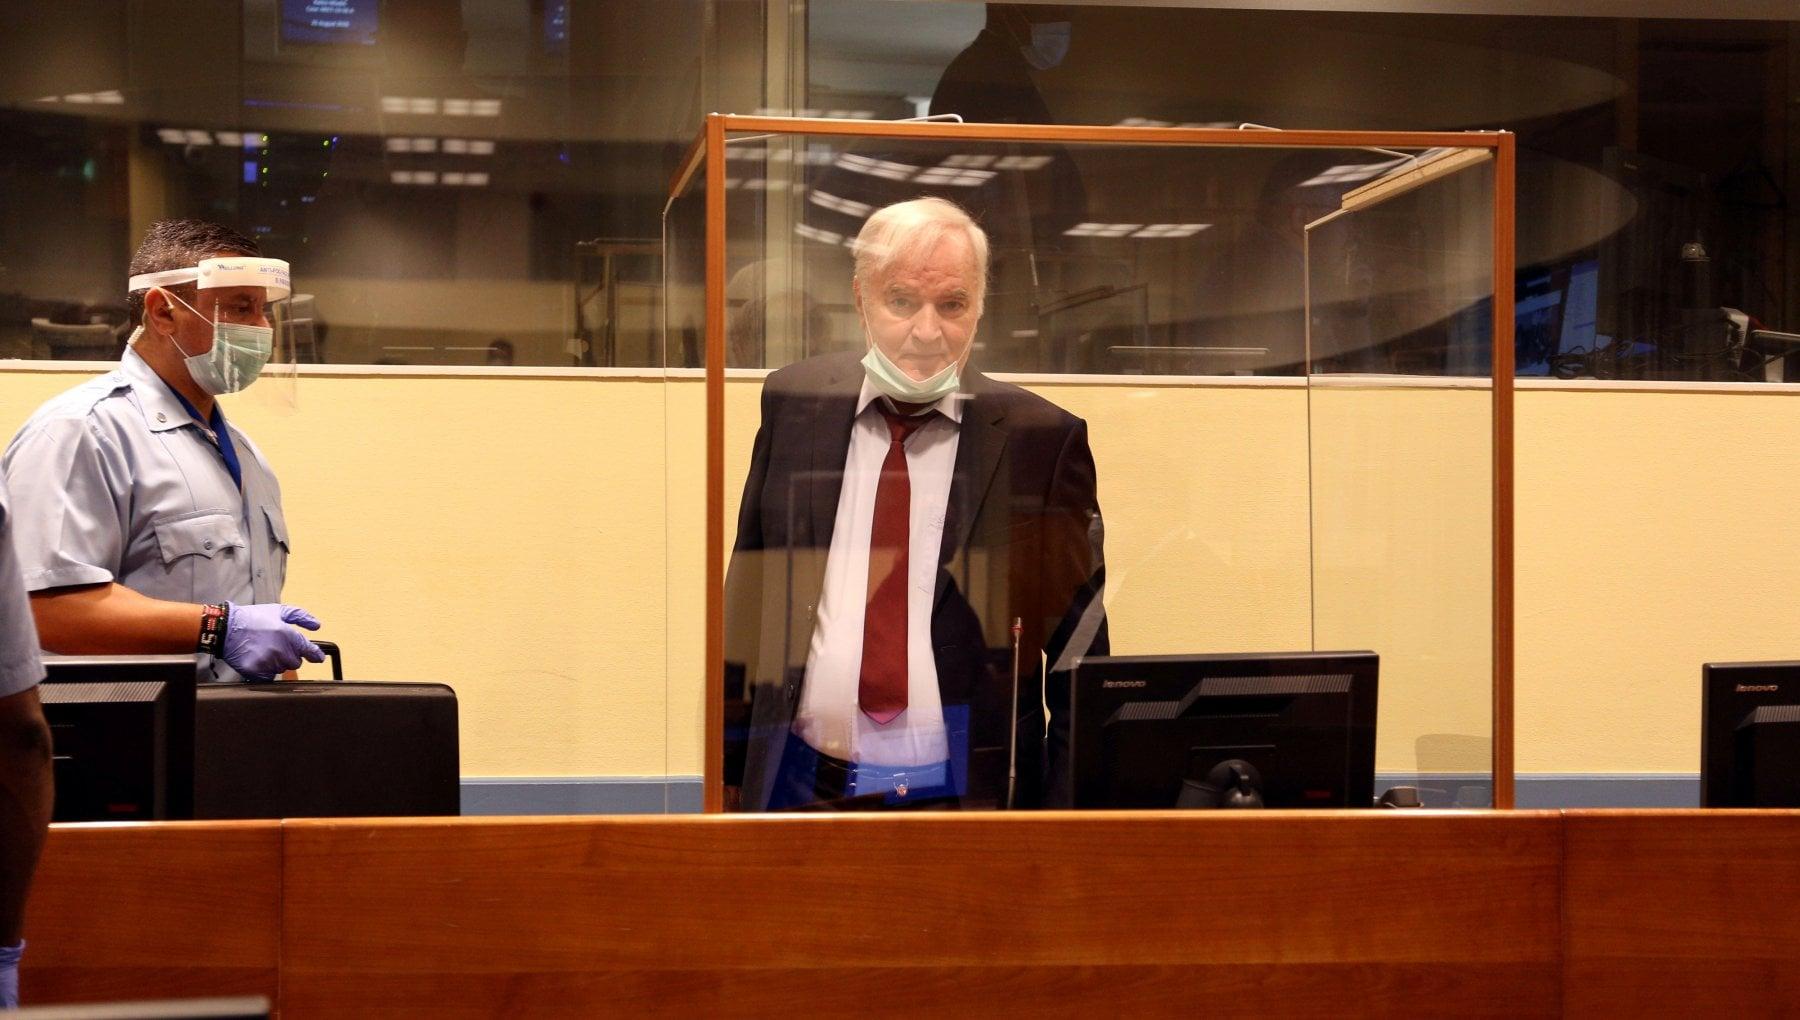 110925090 9a8ed030 1e23 4318 8d8f fa134ecefd2d - Guerra in Bosnia, attesa oggi la sentenza di appello per l'ergastolo all'ex generale Ratko Mladic